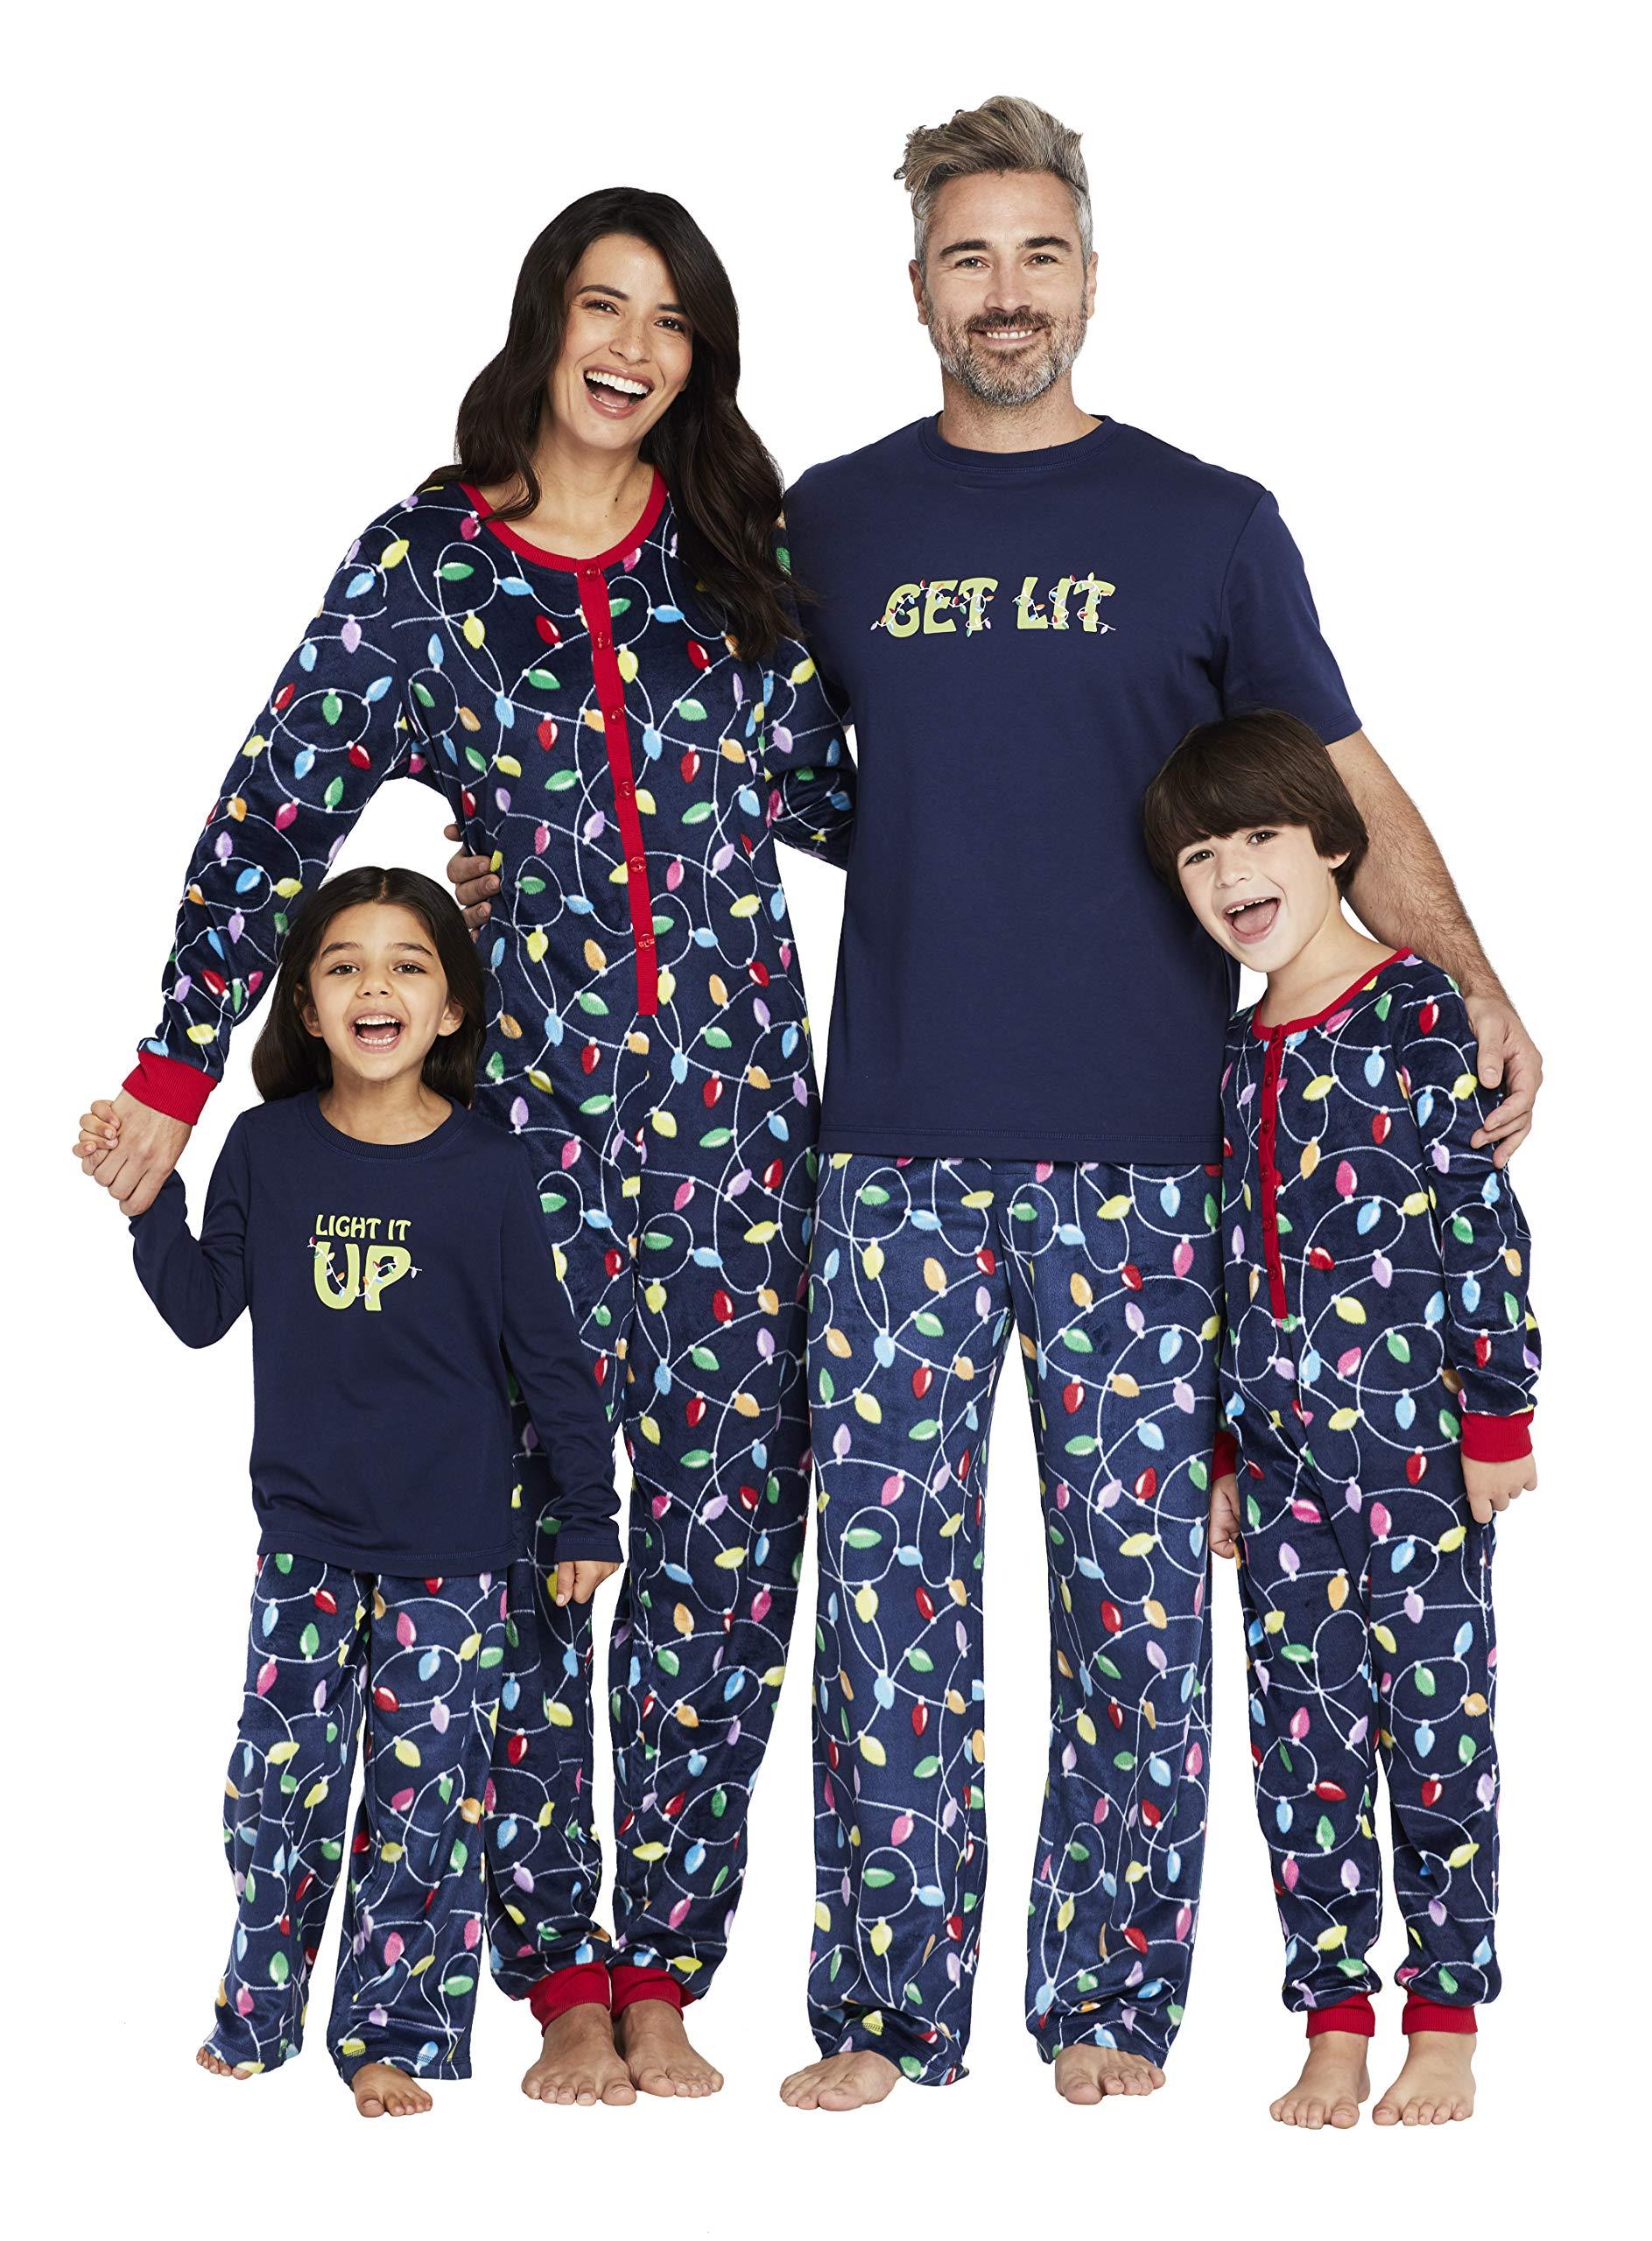 Karen Neuburger Women's ''Get Lit'' Family Matching Christmas Holiday Pajama Sets PJ, Mom 1X, Multicolor Light Bulbs Blue Combo Pj - Get Lit by Karen Neuburger